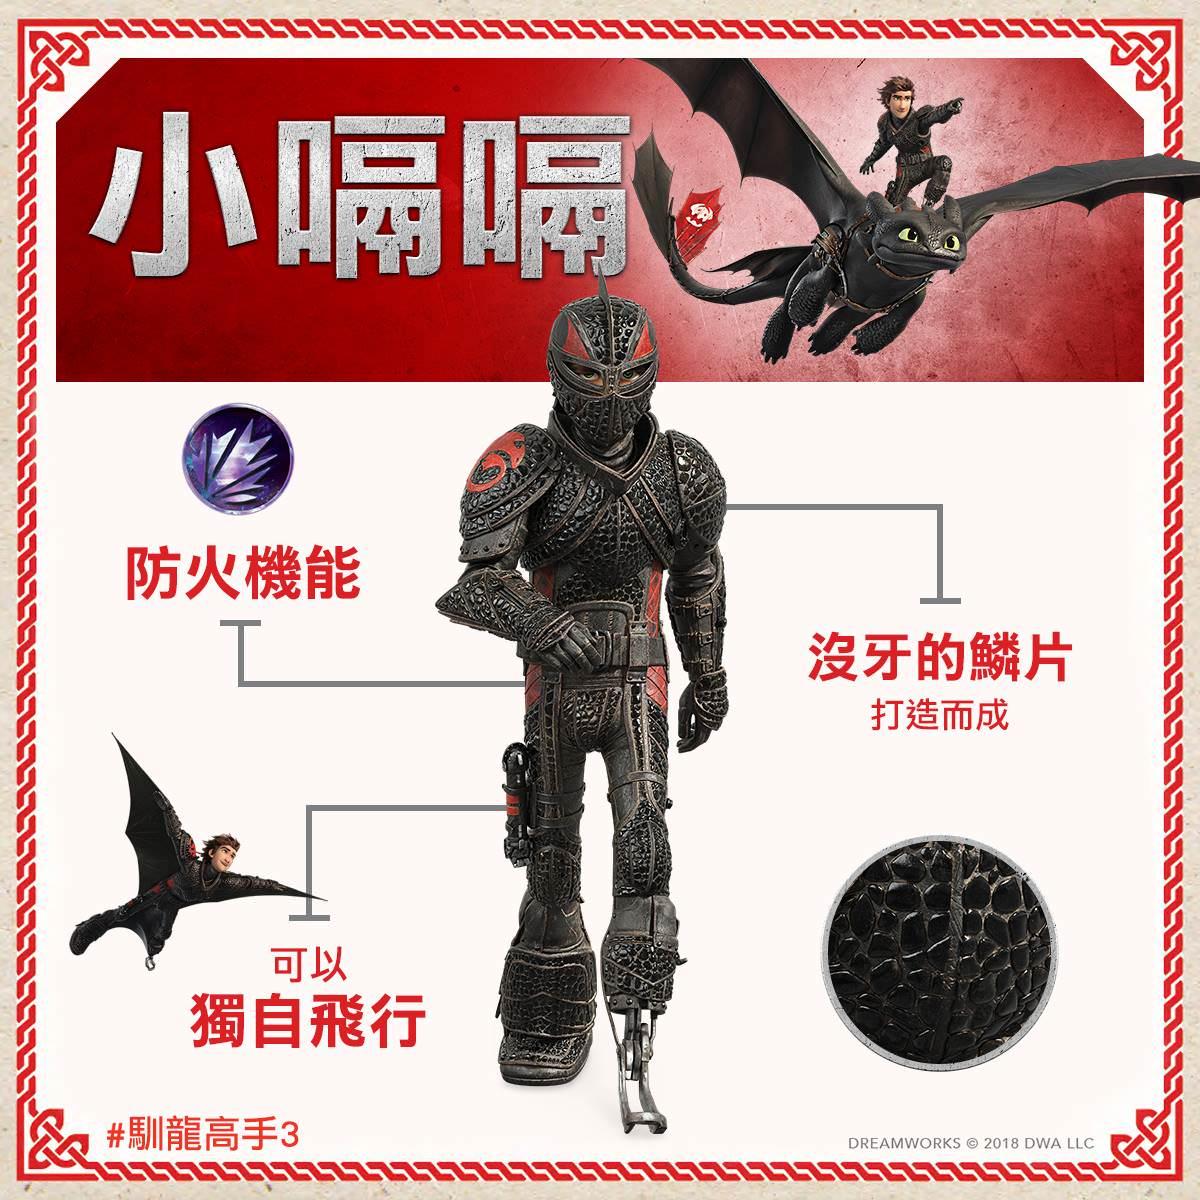 Movie, How to Train Your Dragon: The Hidden World(美國, 2019年) / 馴龍高手3(台灣) /馴龍記3(香港) / 驯龙高手3(中國), 網路宣傳, 角色介紹卡